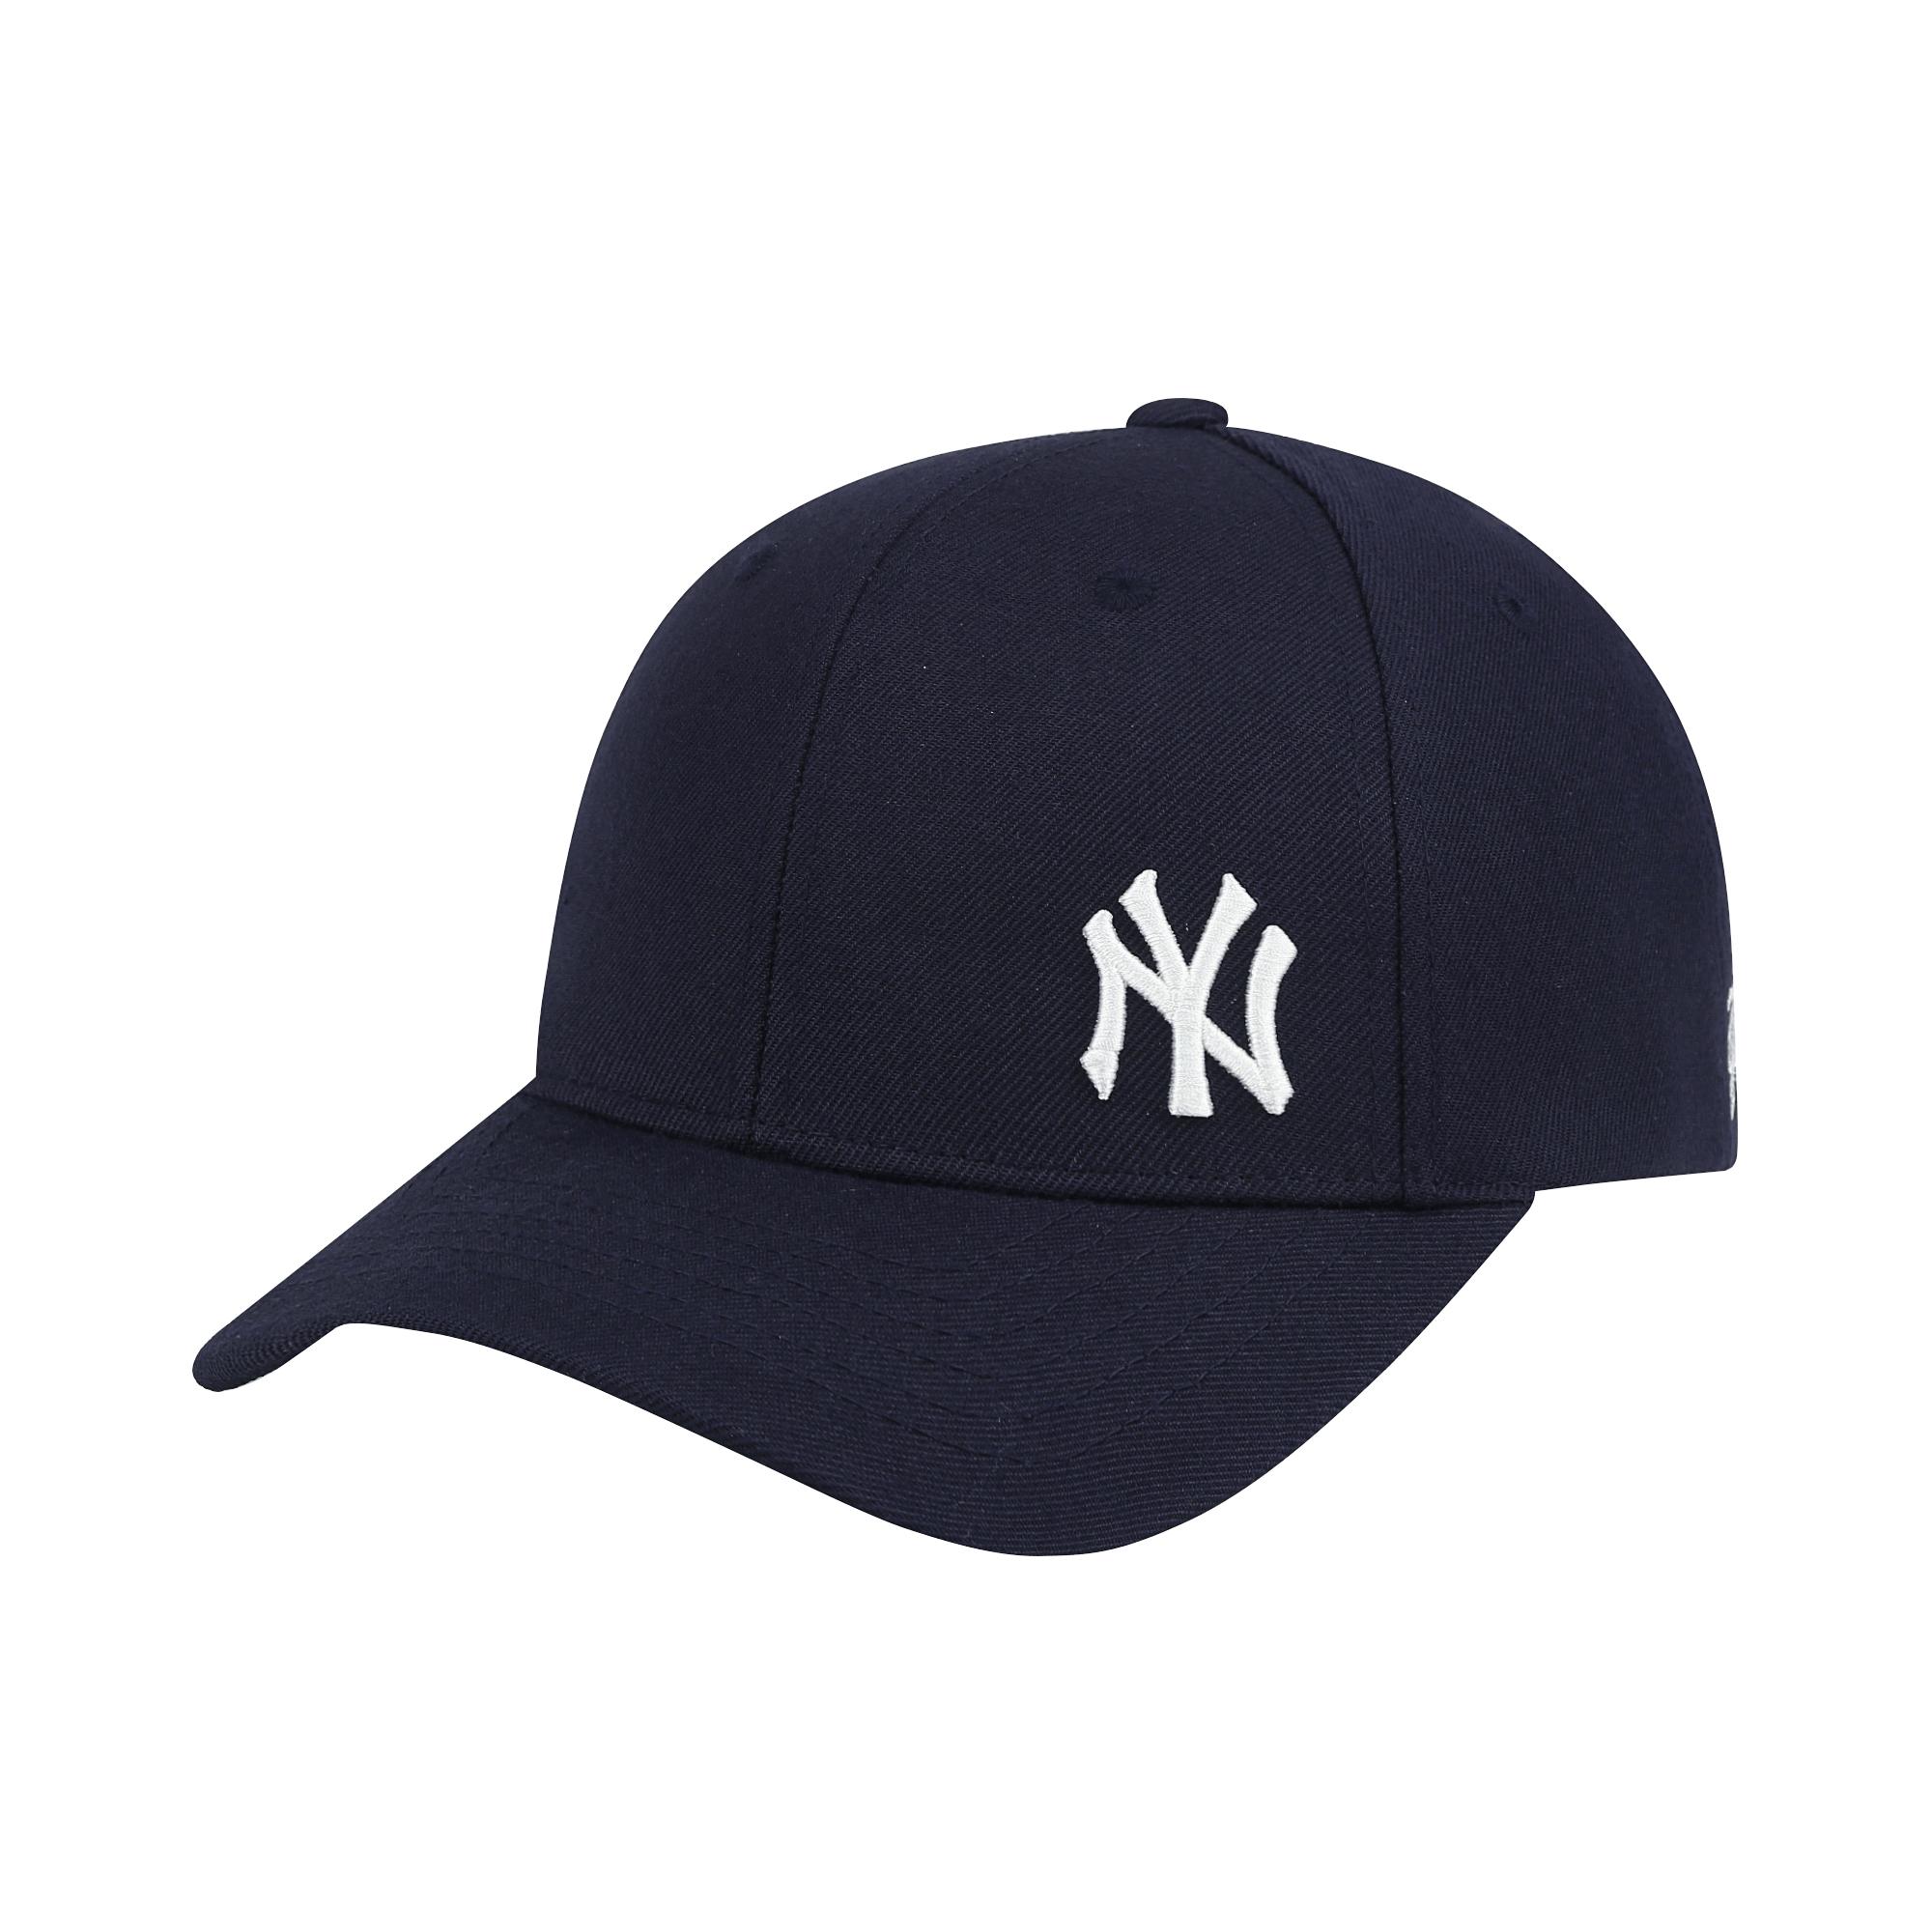 NEW YORK YANKEES AUTHENTIC SMALL LOGO ADJUSTABLE CAP